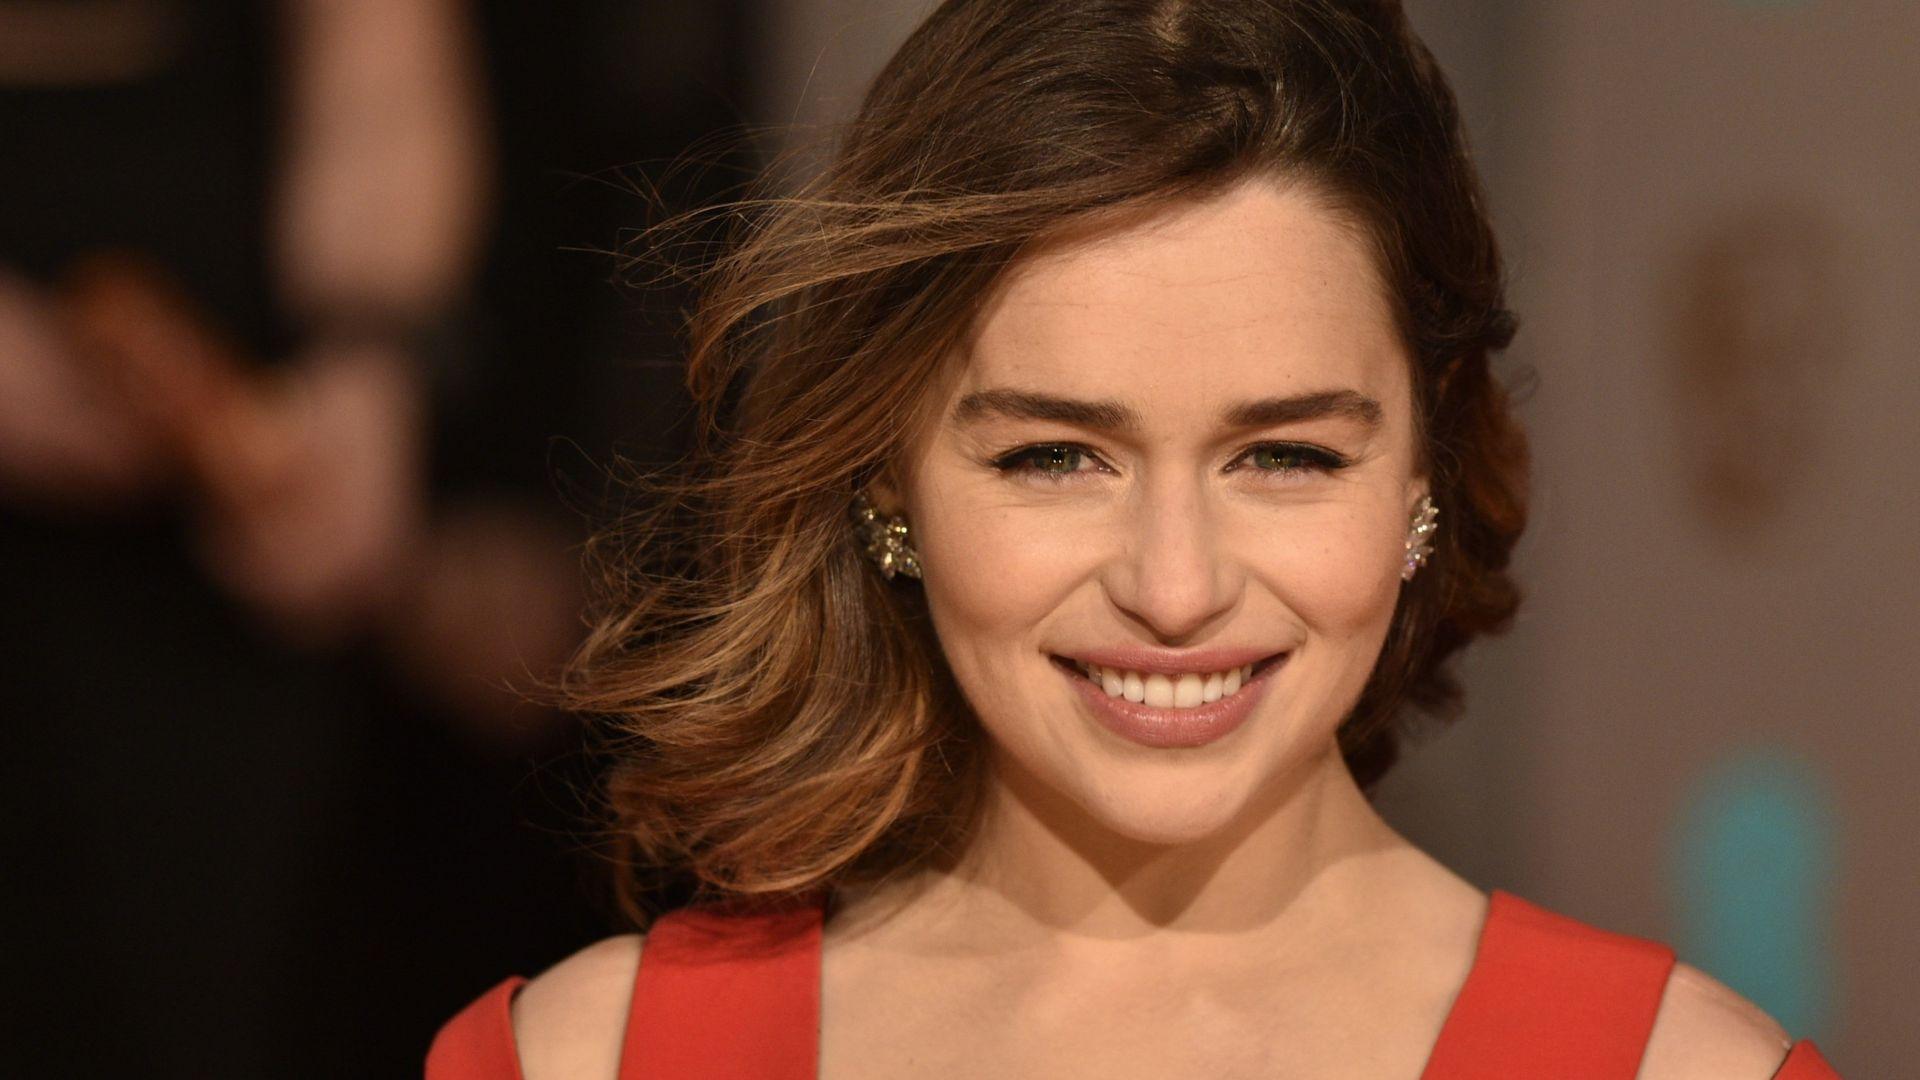 Wallpaper Emilia clarke, smiling, cute actress, 4k